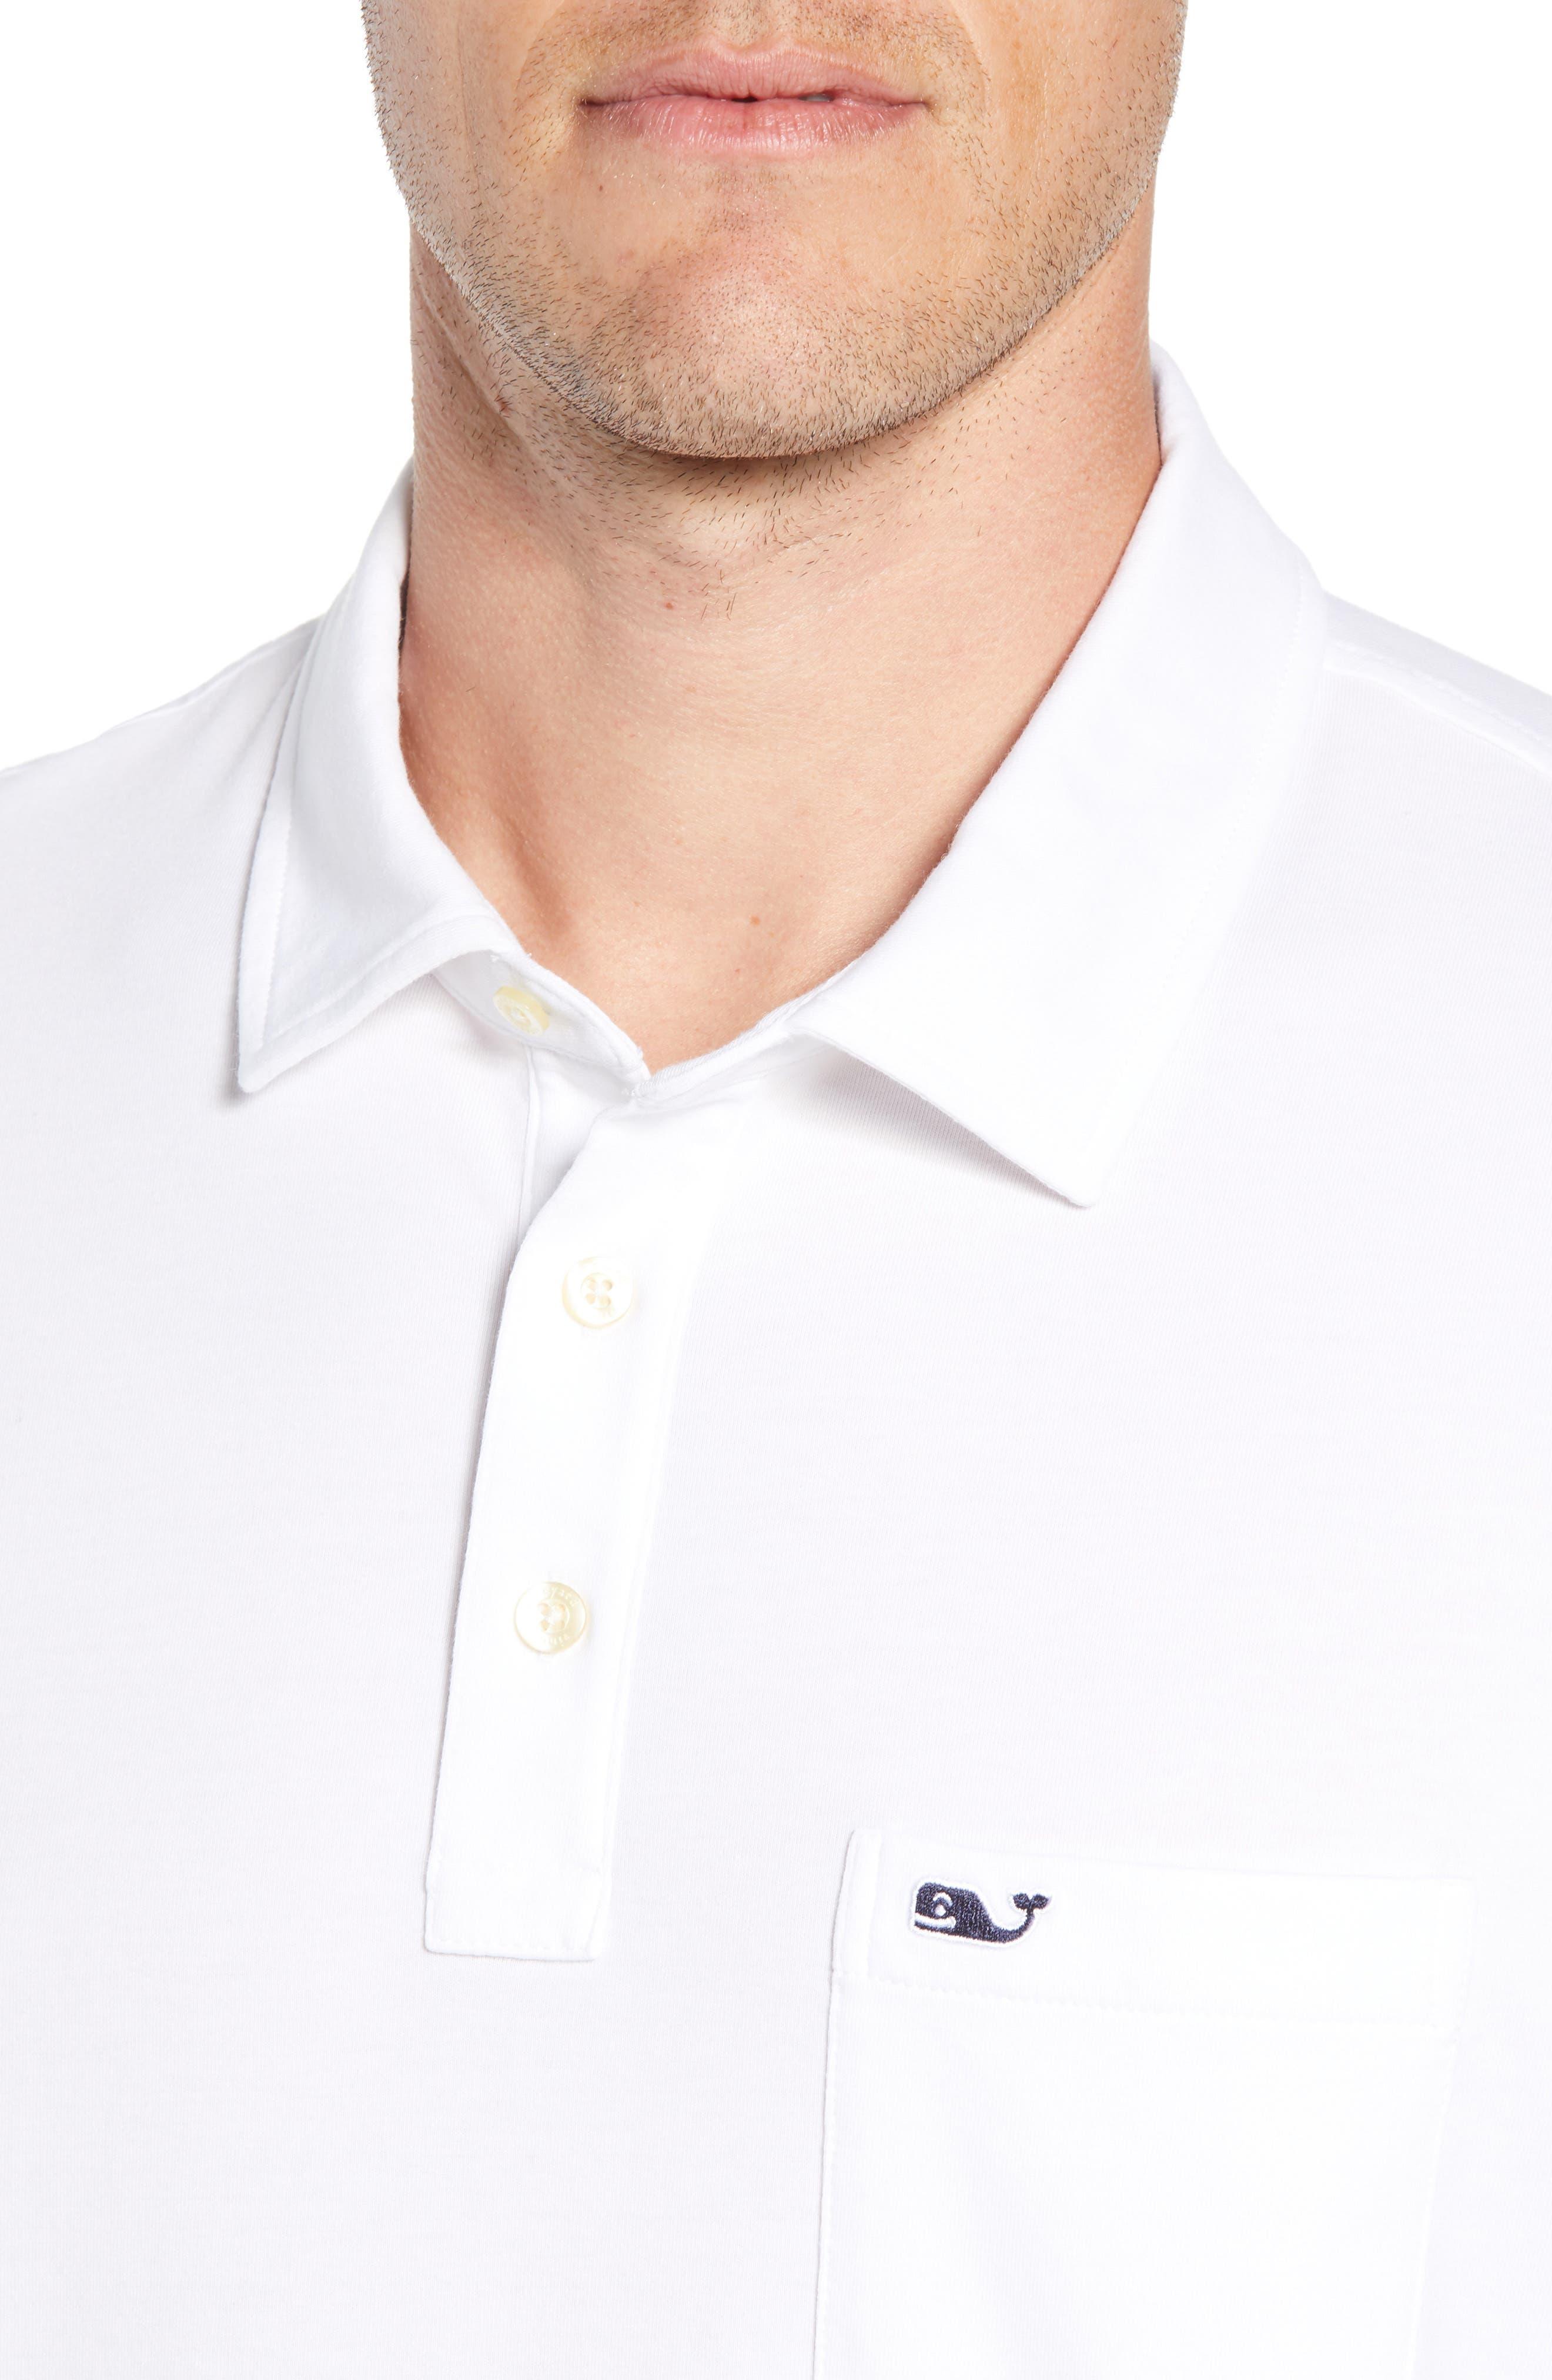 VINEYARD VINES, Edgartown Polo Shirt, Alternate thumbnail 4, color, WHITE CAP